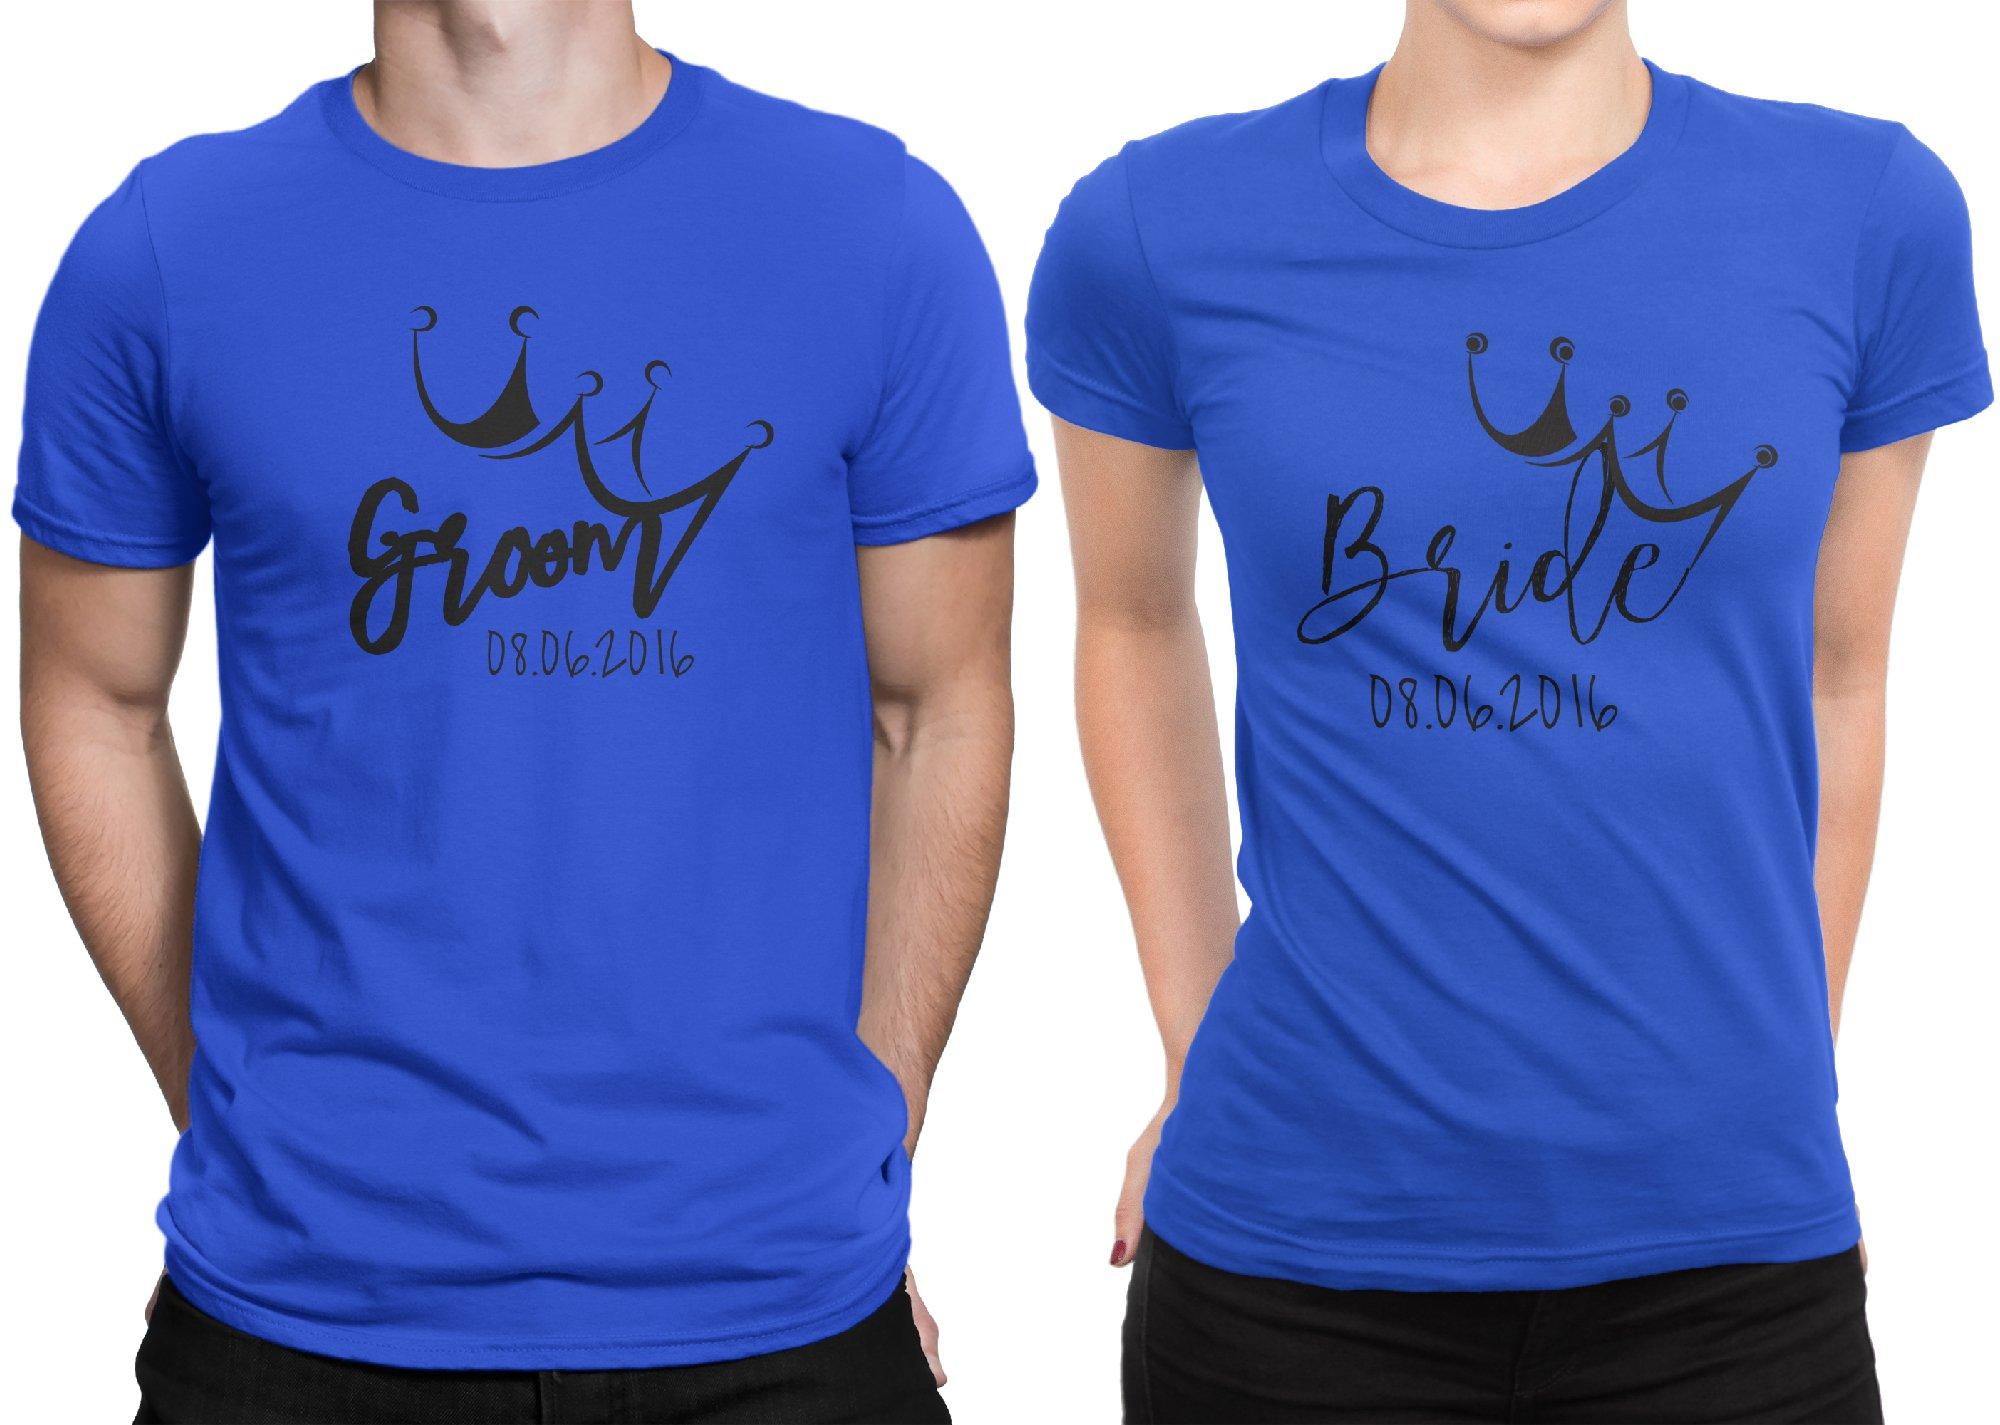 Groom Bride Crown Newly Married Couple Matching T-shirt Honeymoon valentines Men X-Large / Women Medium | Royal Blue - Royal Blue